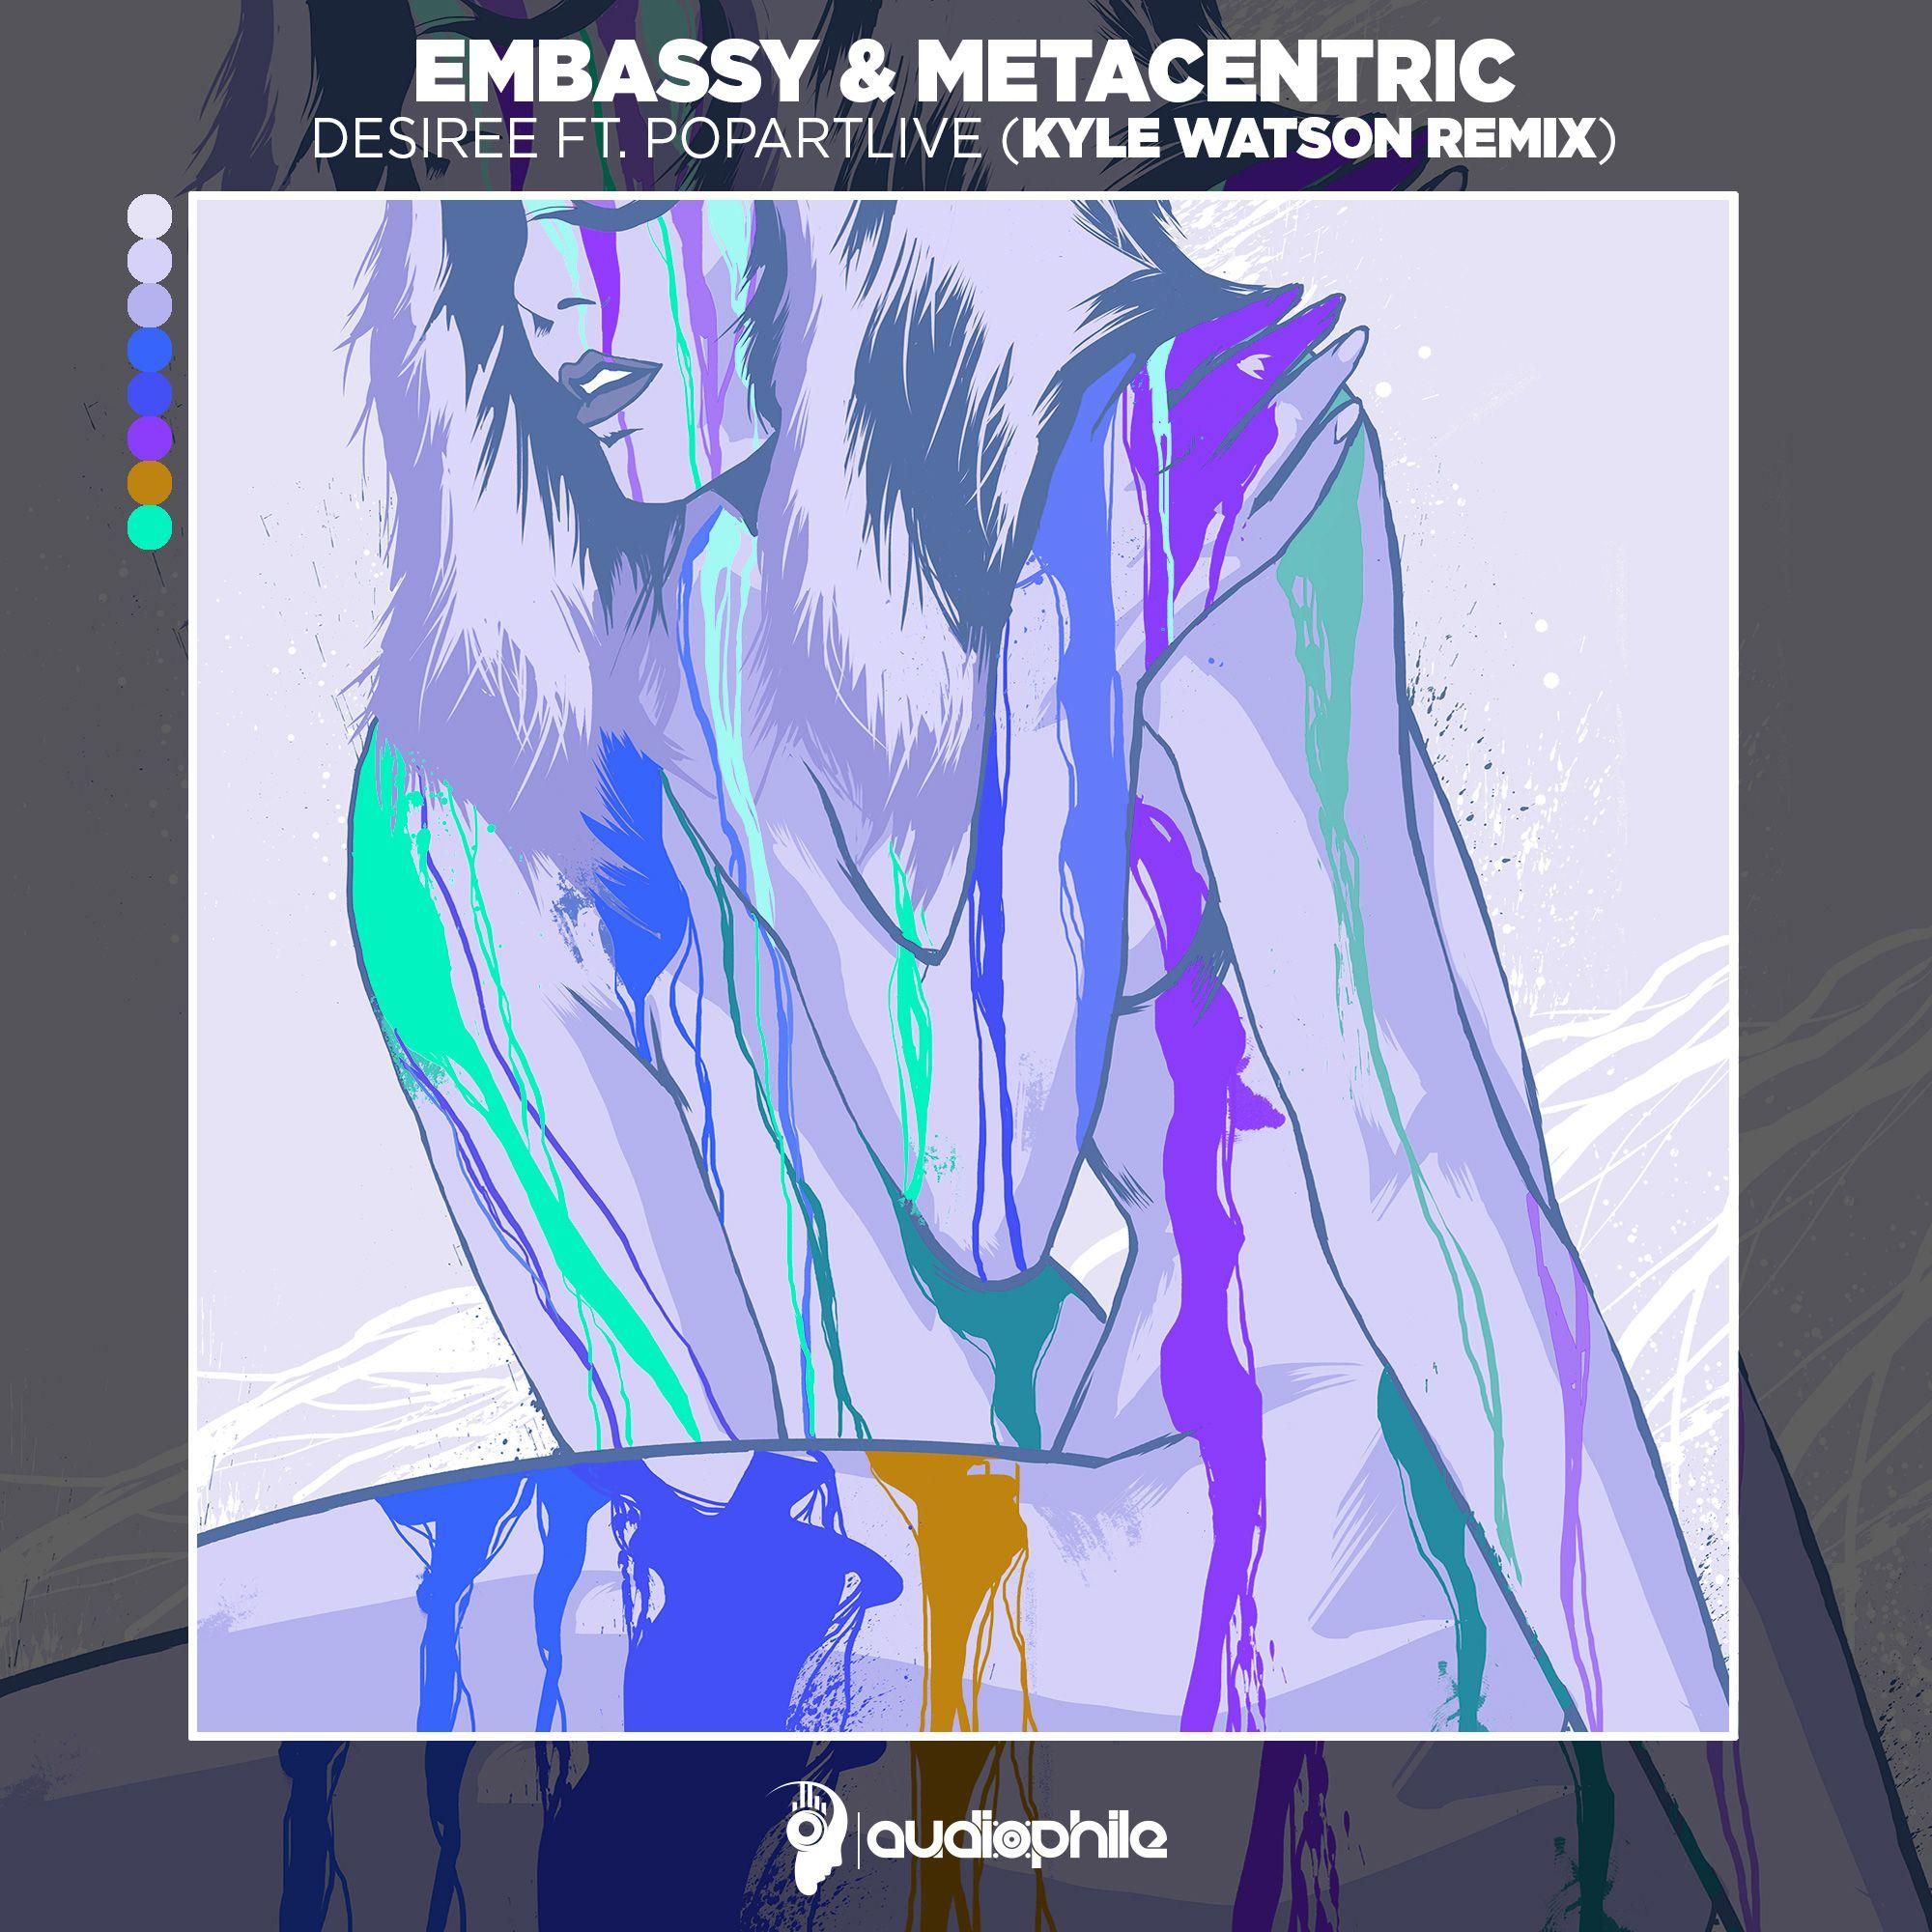 embassy_metacentric_-_desiree_ft._popartlive_kyle_watson_remix.jpg